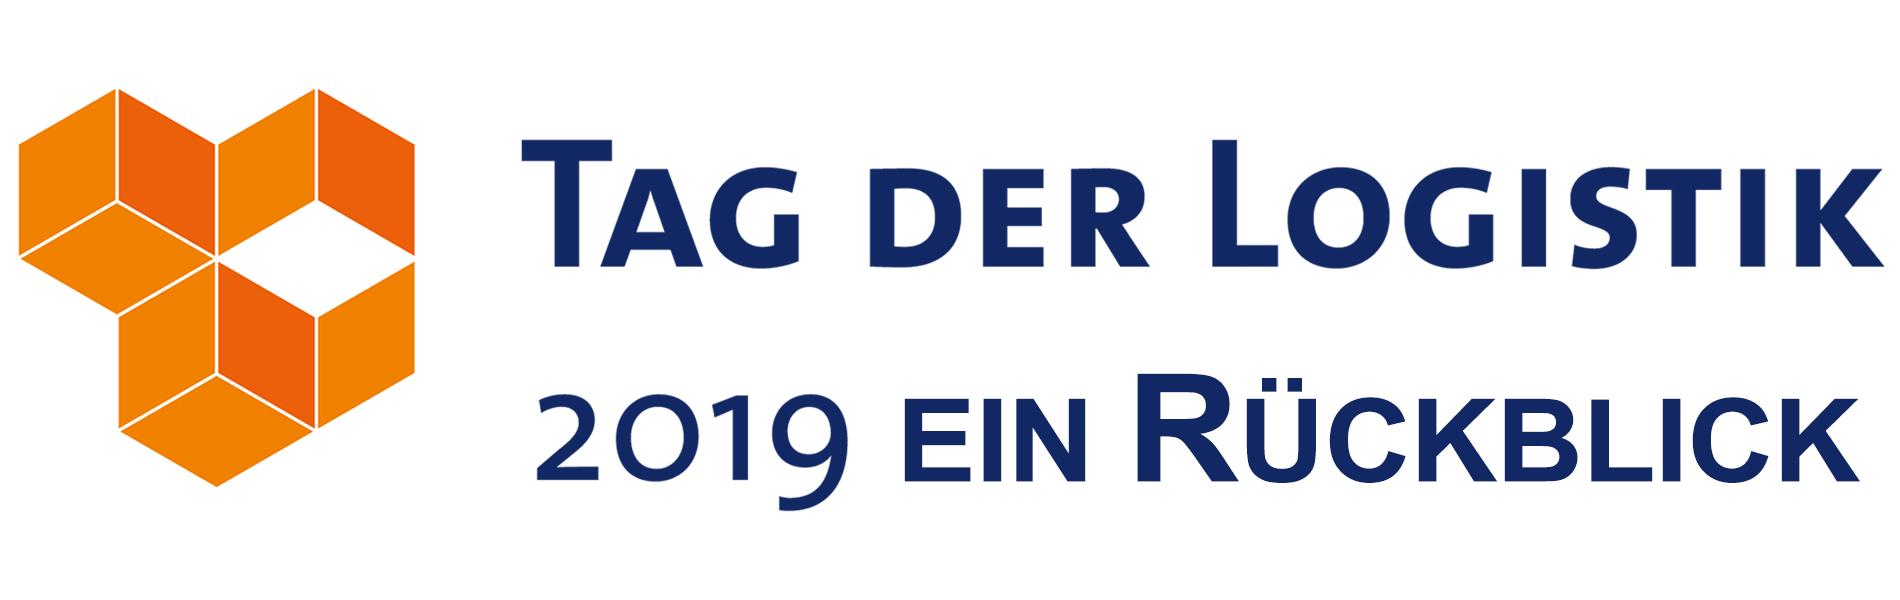 Logistik macht's möglich – Rückblick Tag der Logistik 2019